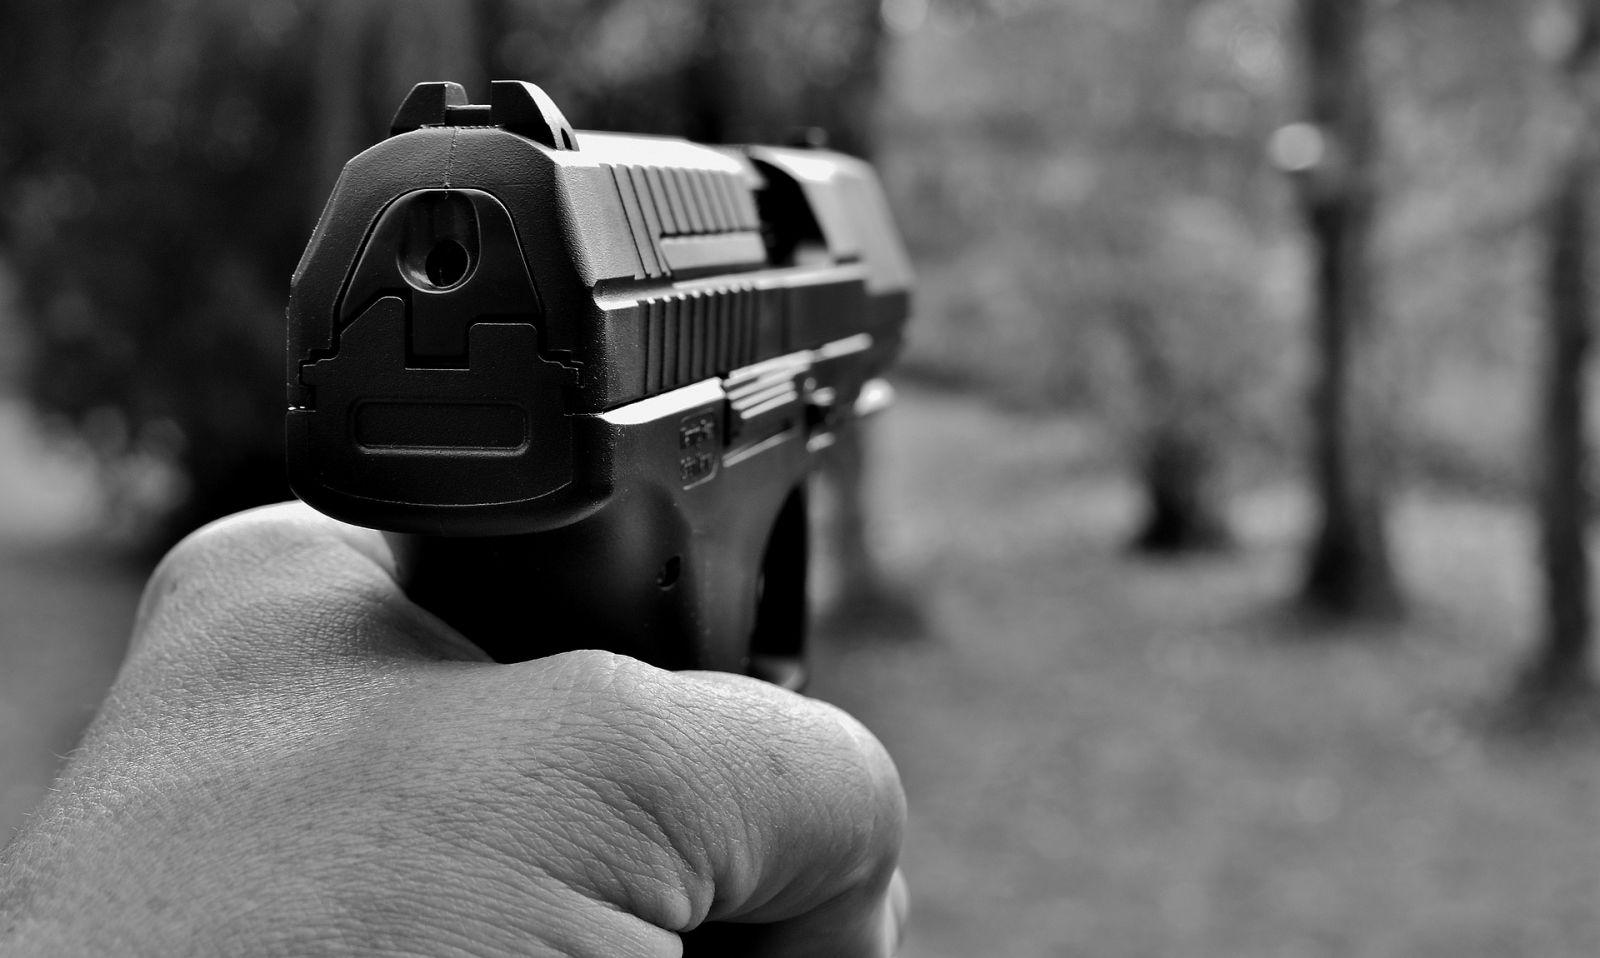 Не дал сдачу: в Николаеве пассажир обстрелял маршрутчика